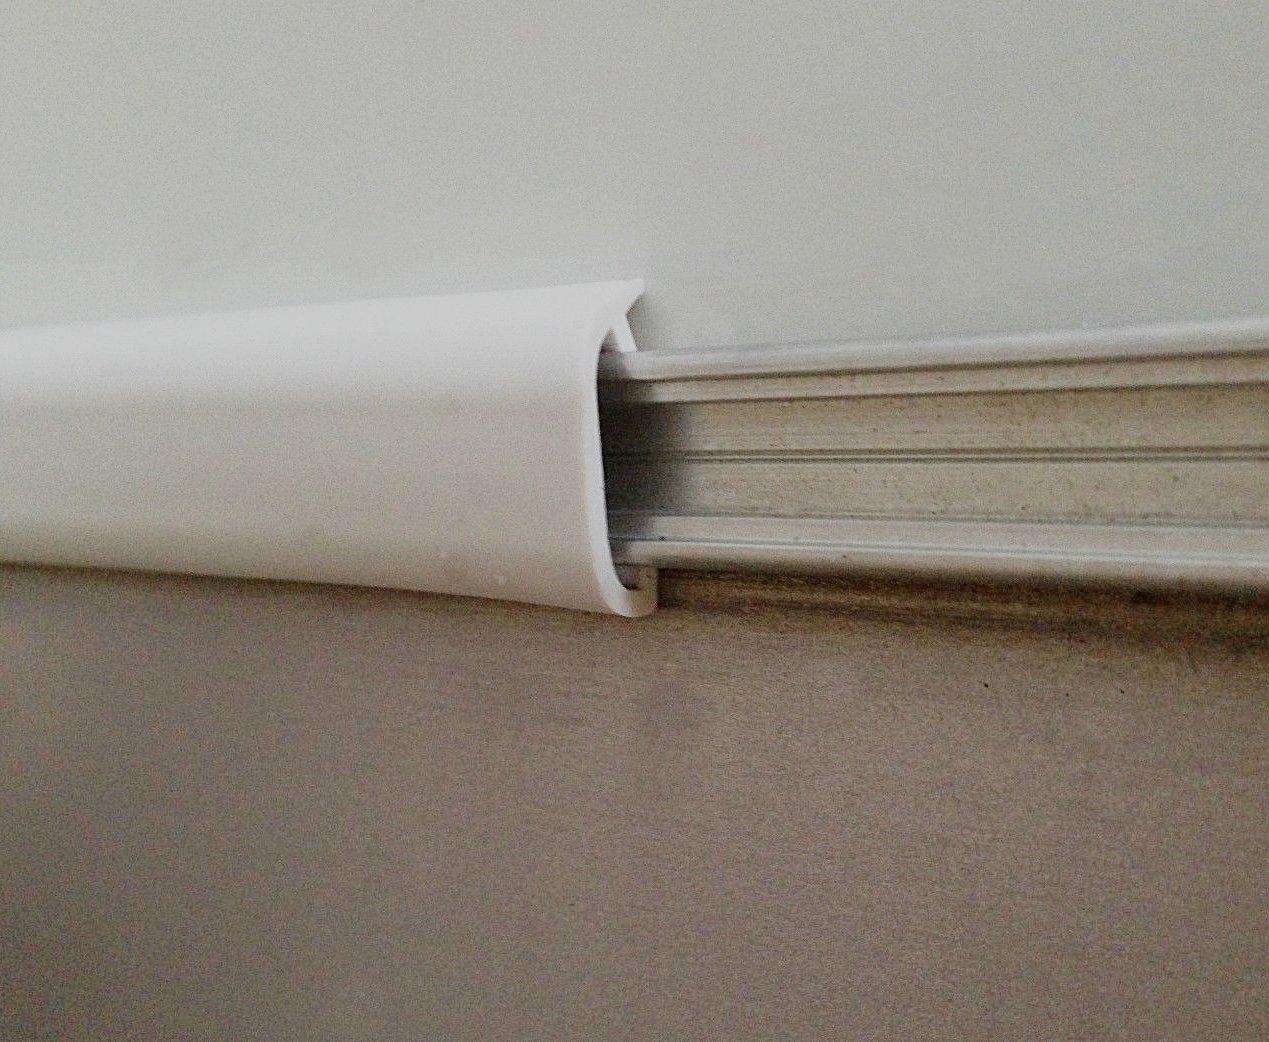 WHITE RV Marine Camper Vinyl 3//4 x 50 Trim Molding Flexible Screw Cap Cover 50 ft, White